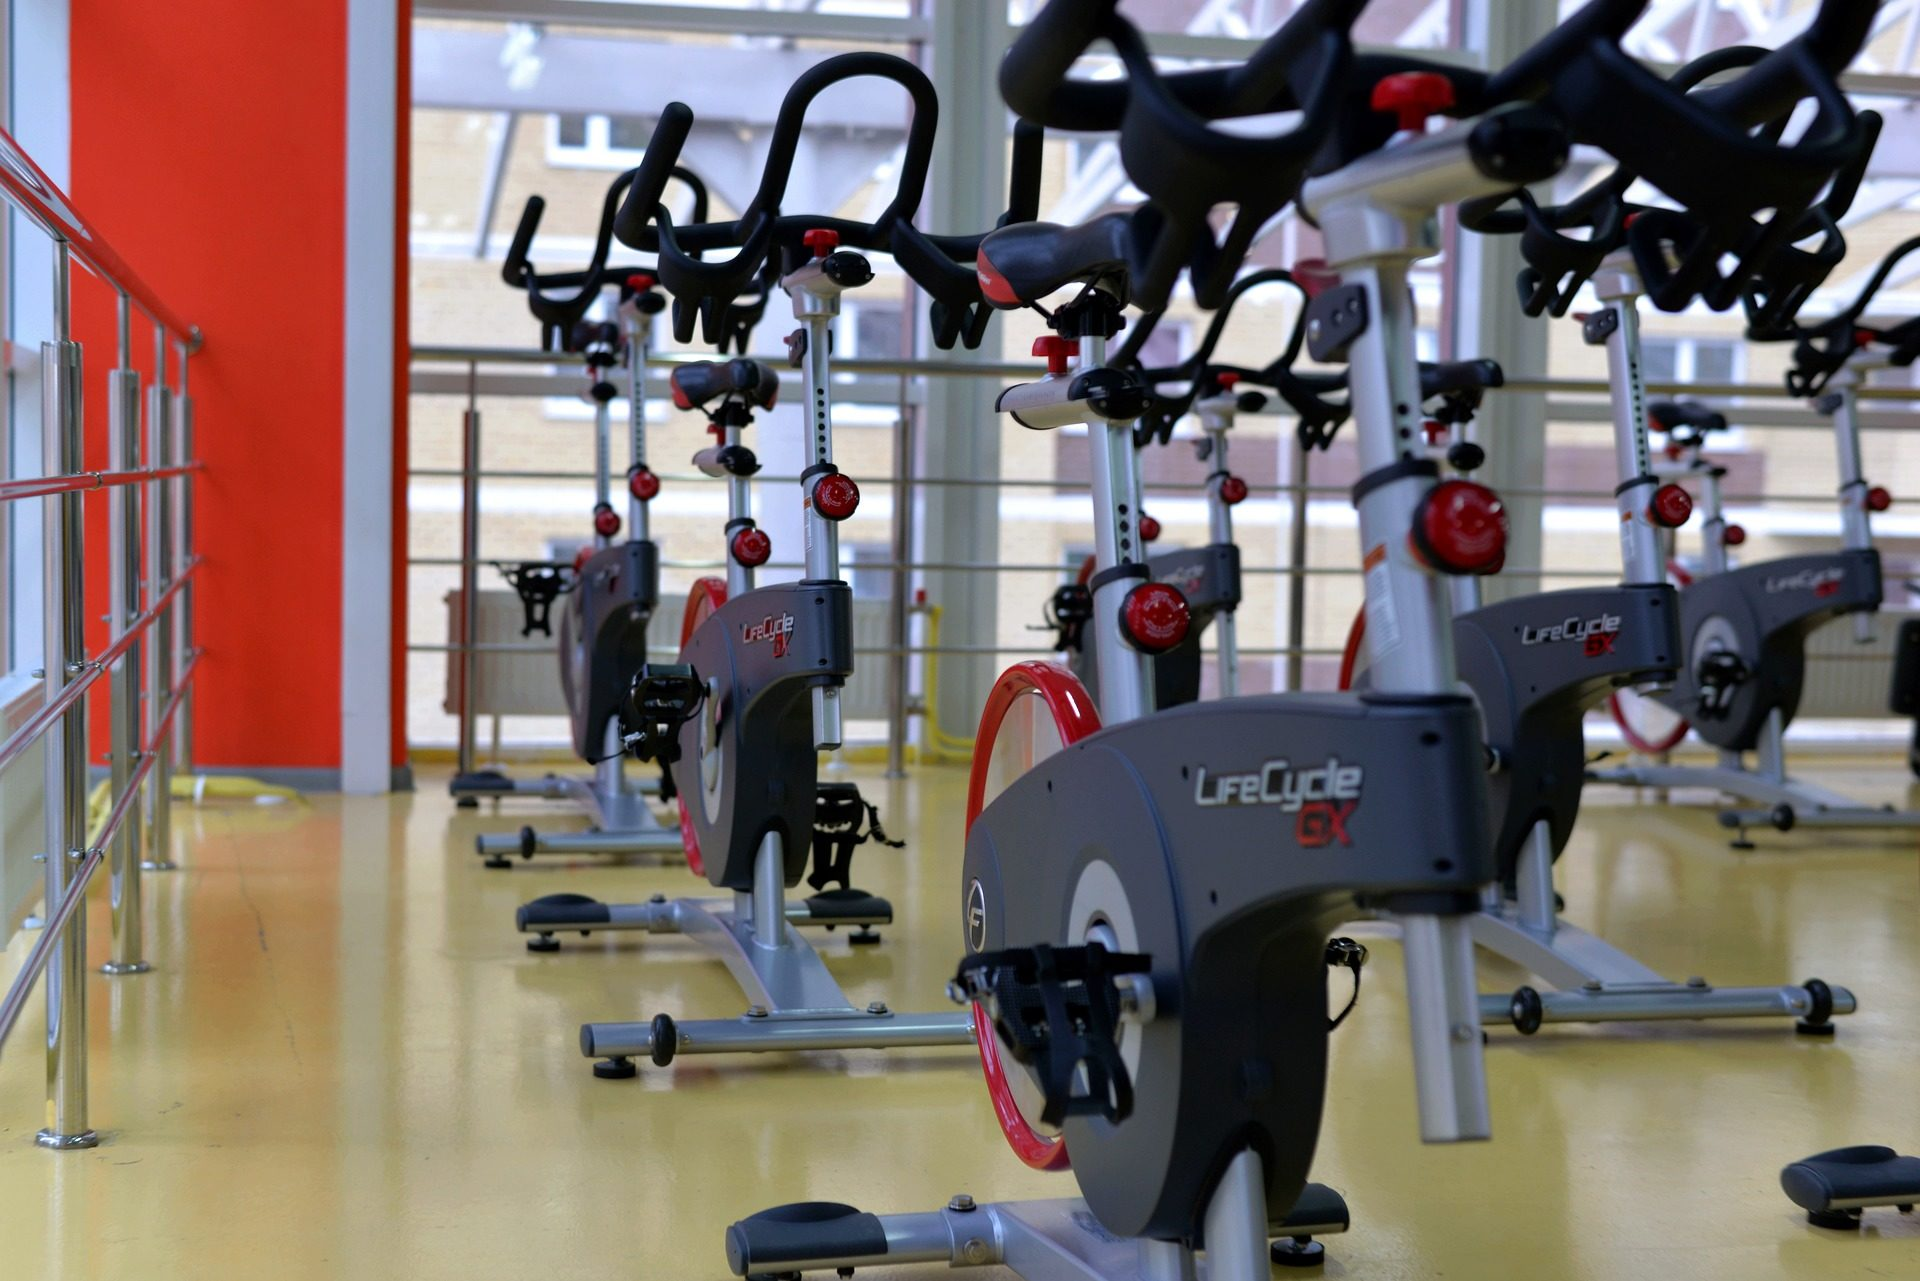 Fondo de pantalla de bicicletas est ticas gimnasio for Articulos para gimnasio